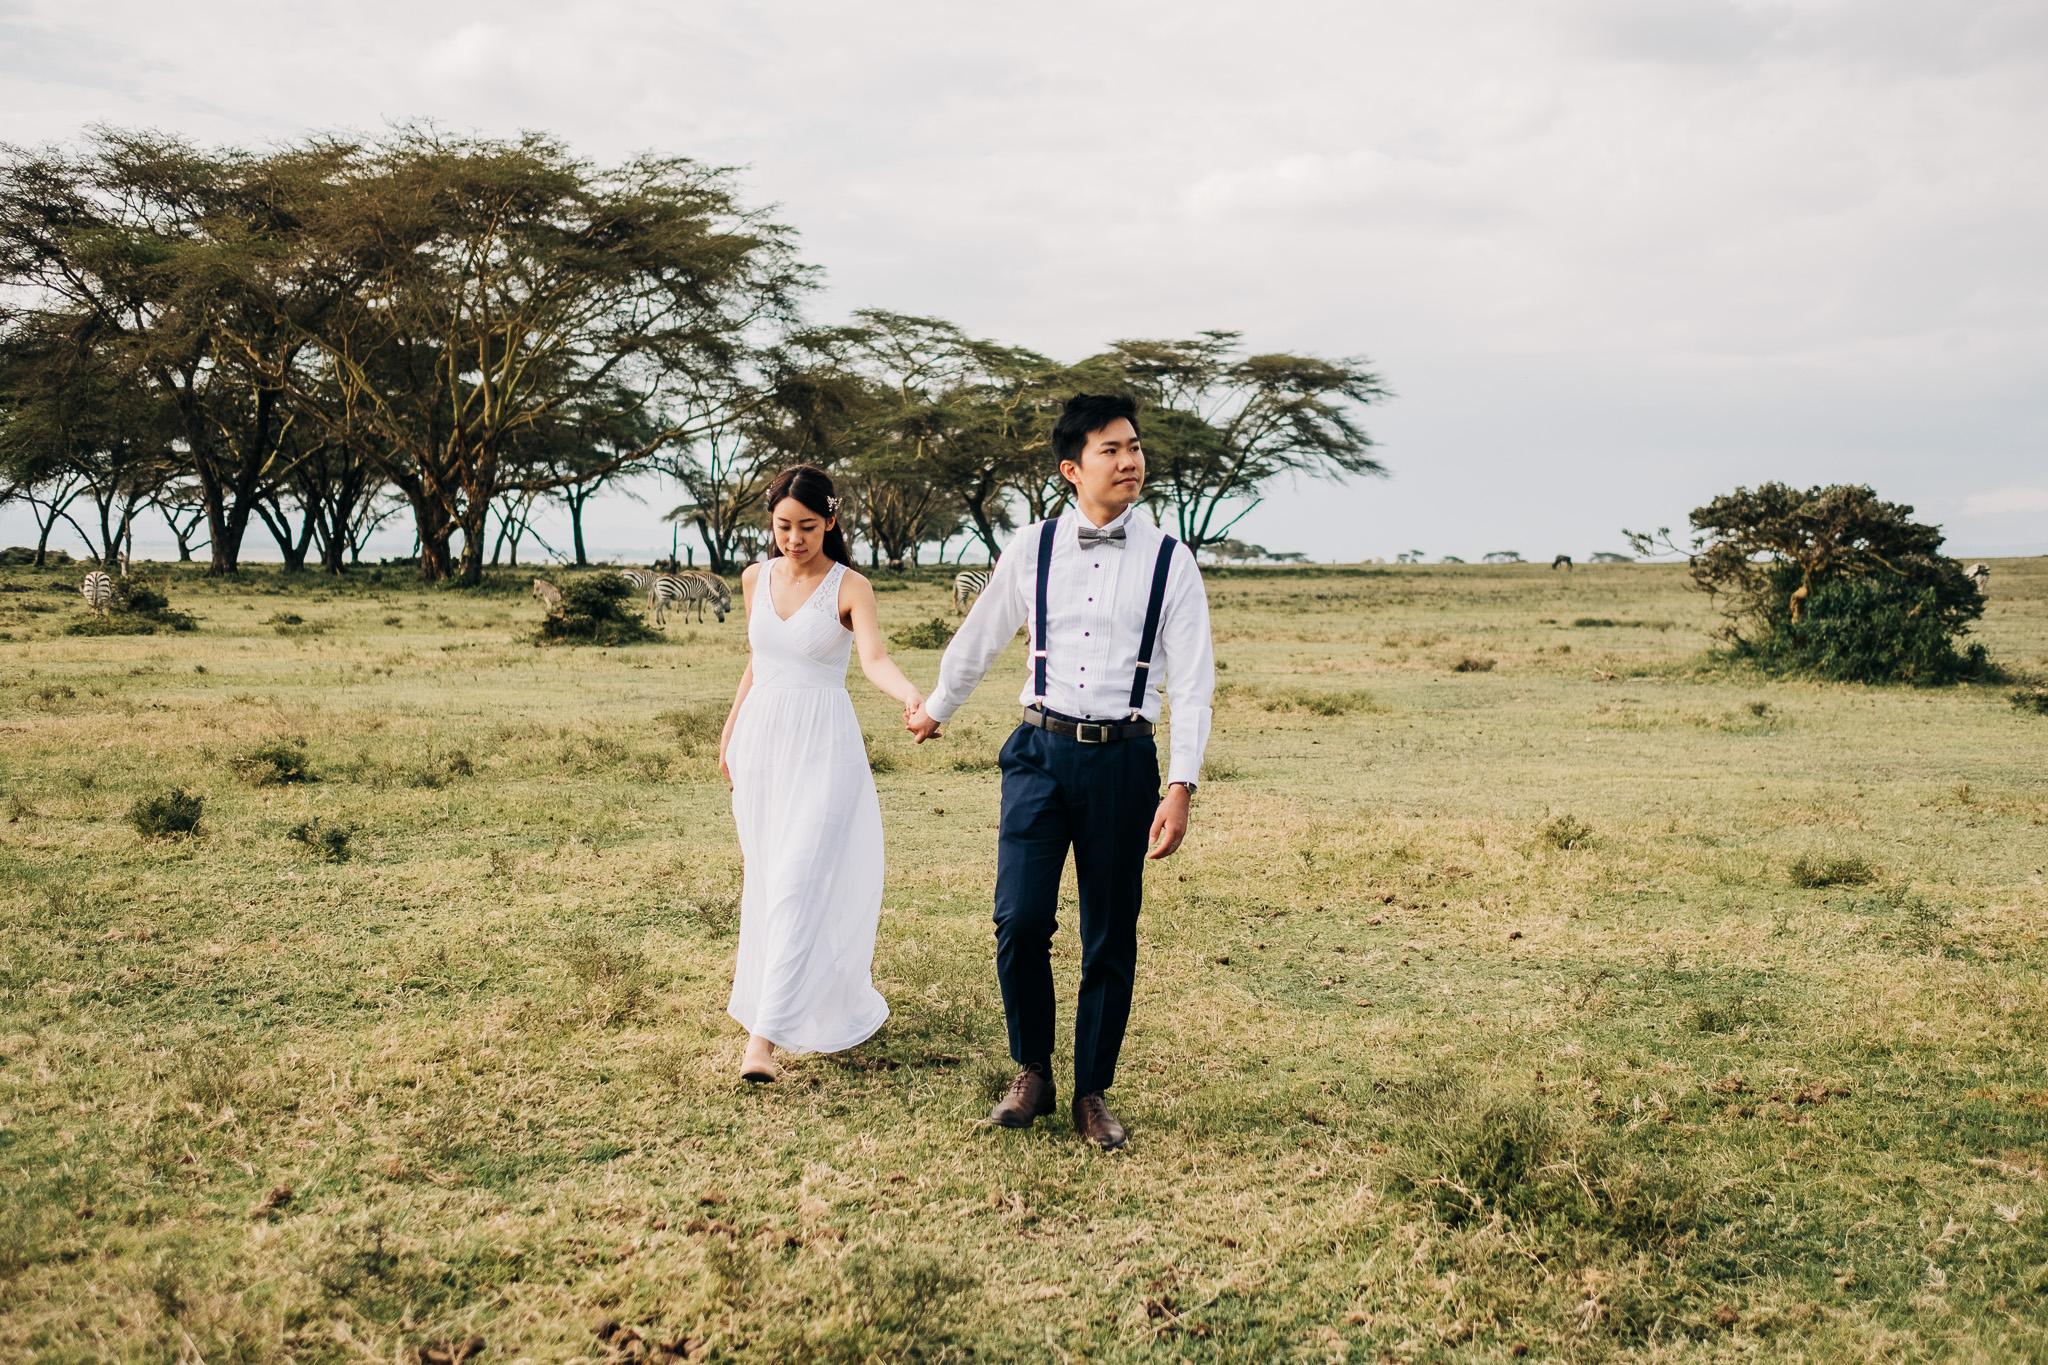 Anna-Hari-Photography-Safari-Elopement-Kenya-Wedding-Photographer-Kenya-30.jpg